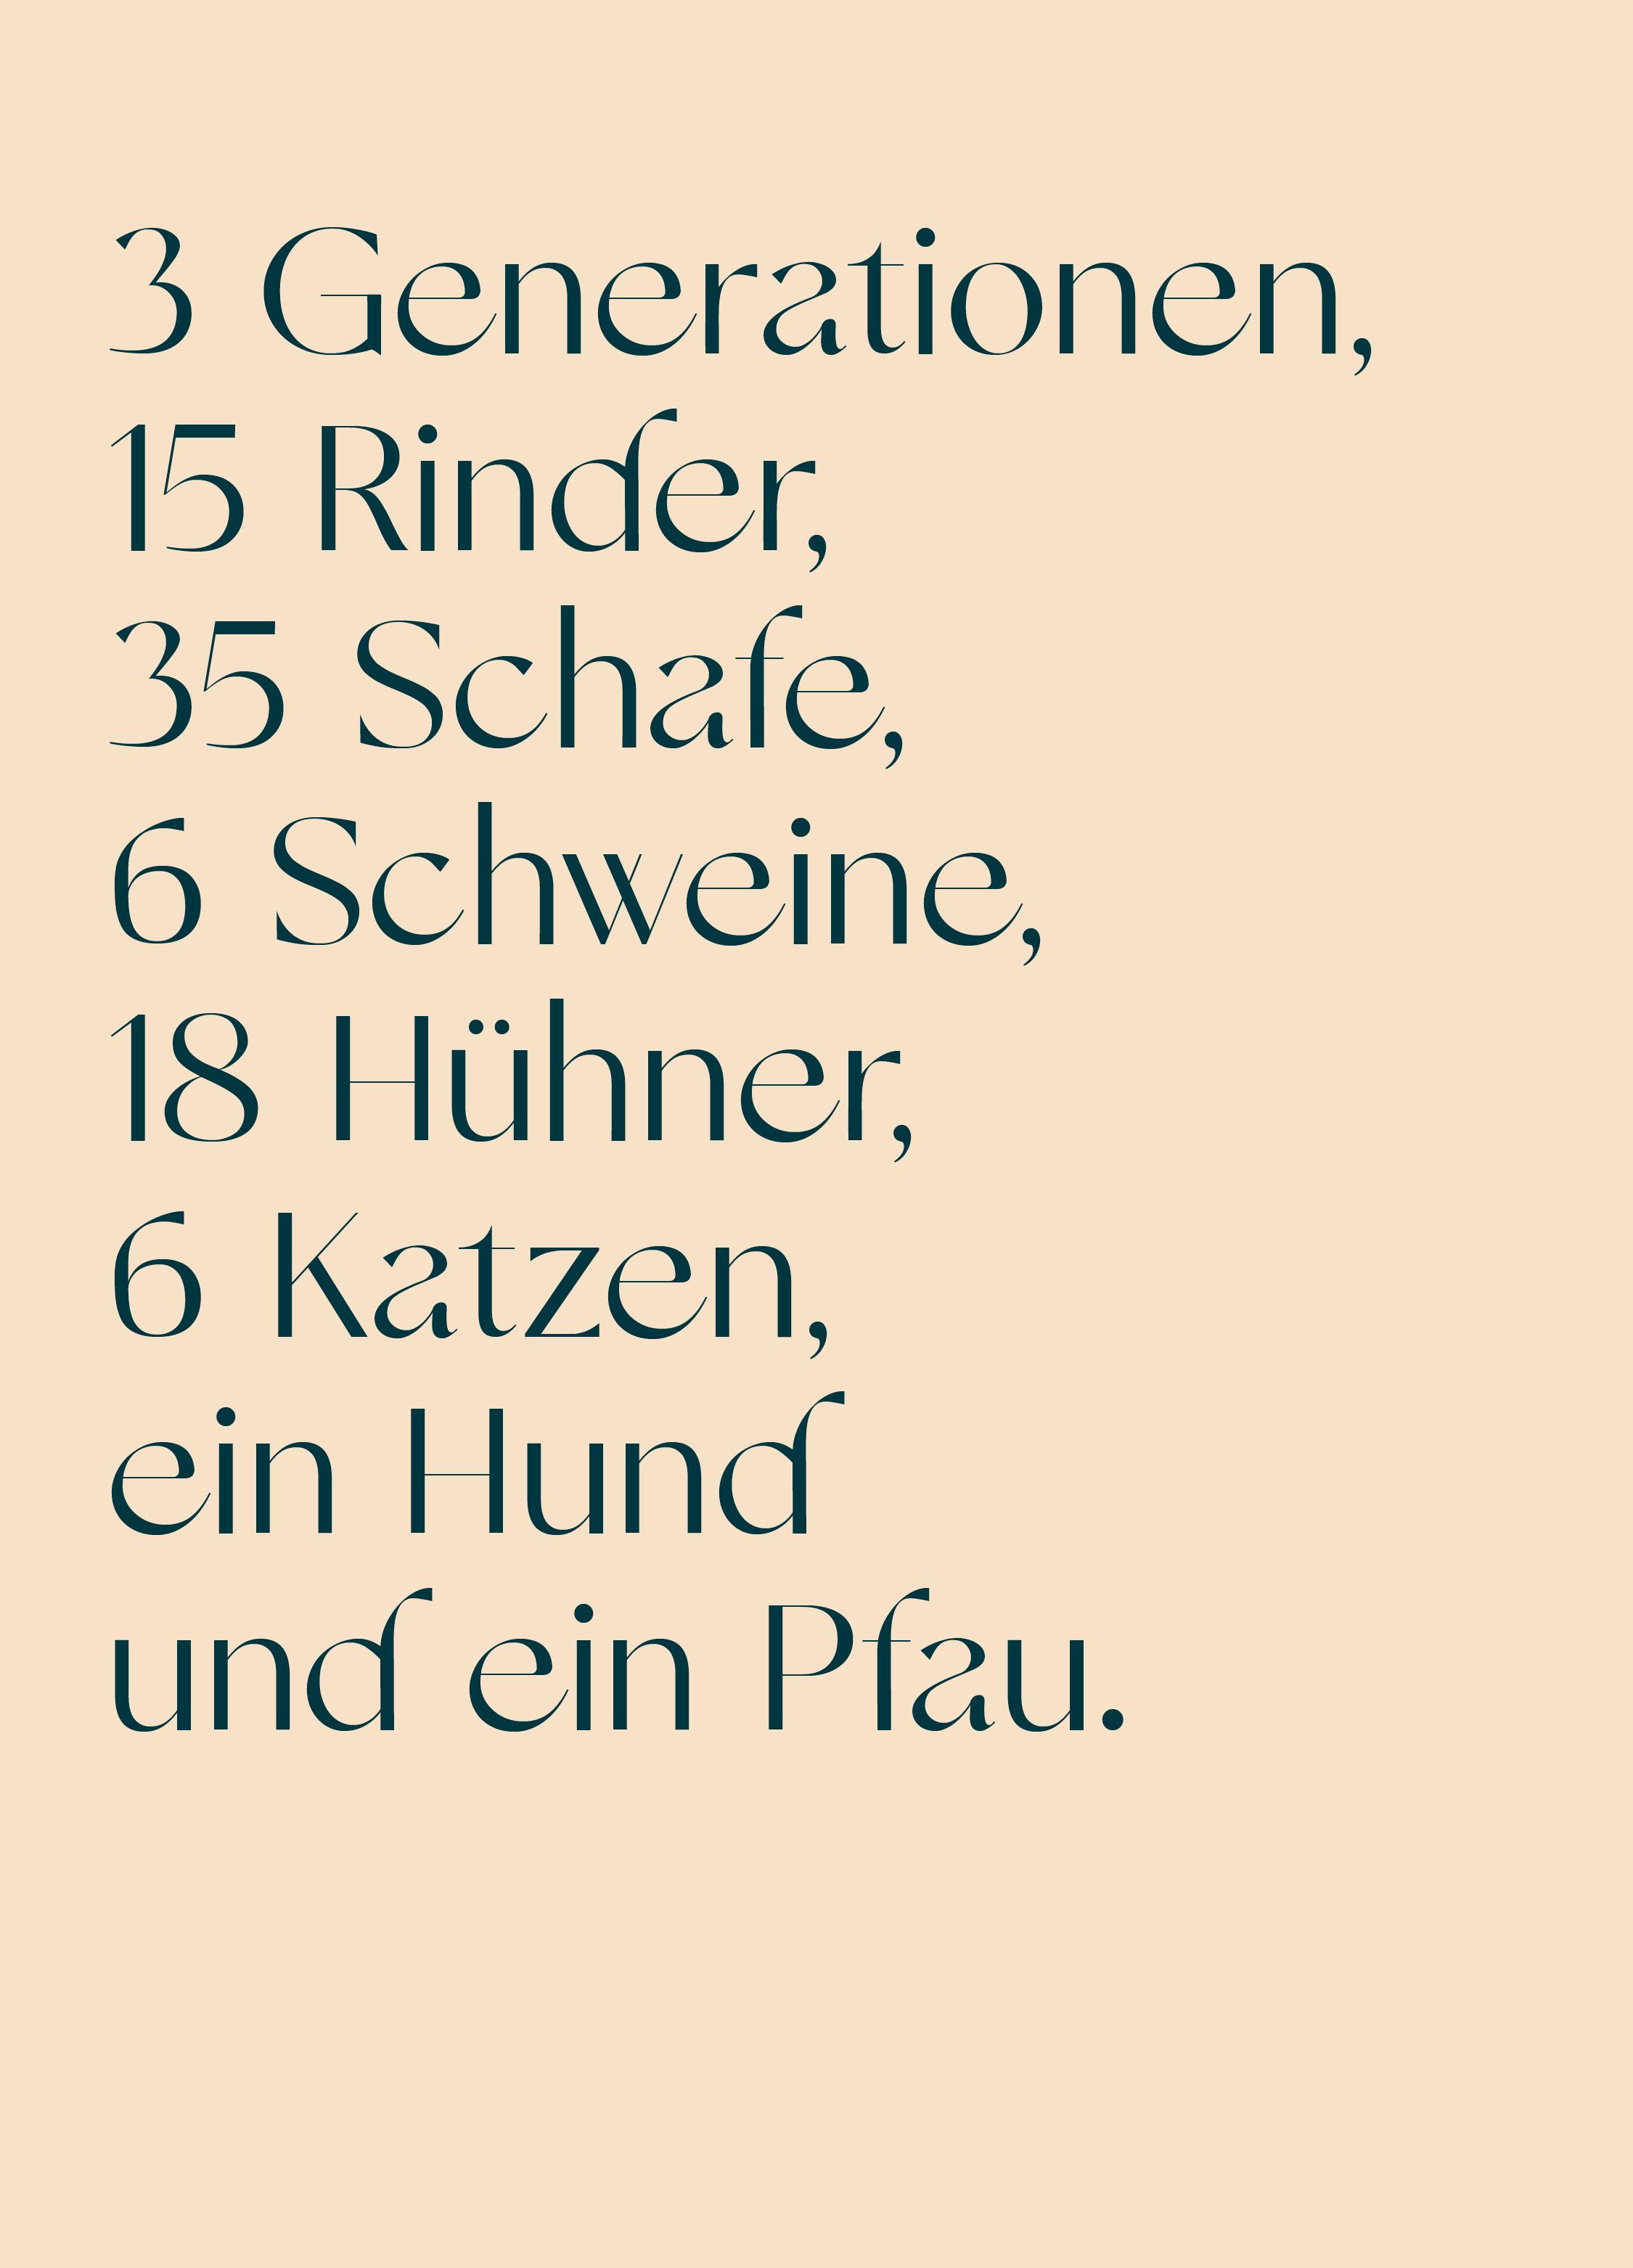 Ref Faehrfrau Website 9 Generationen